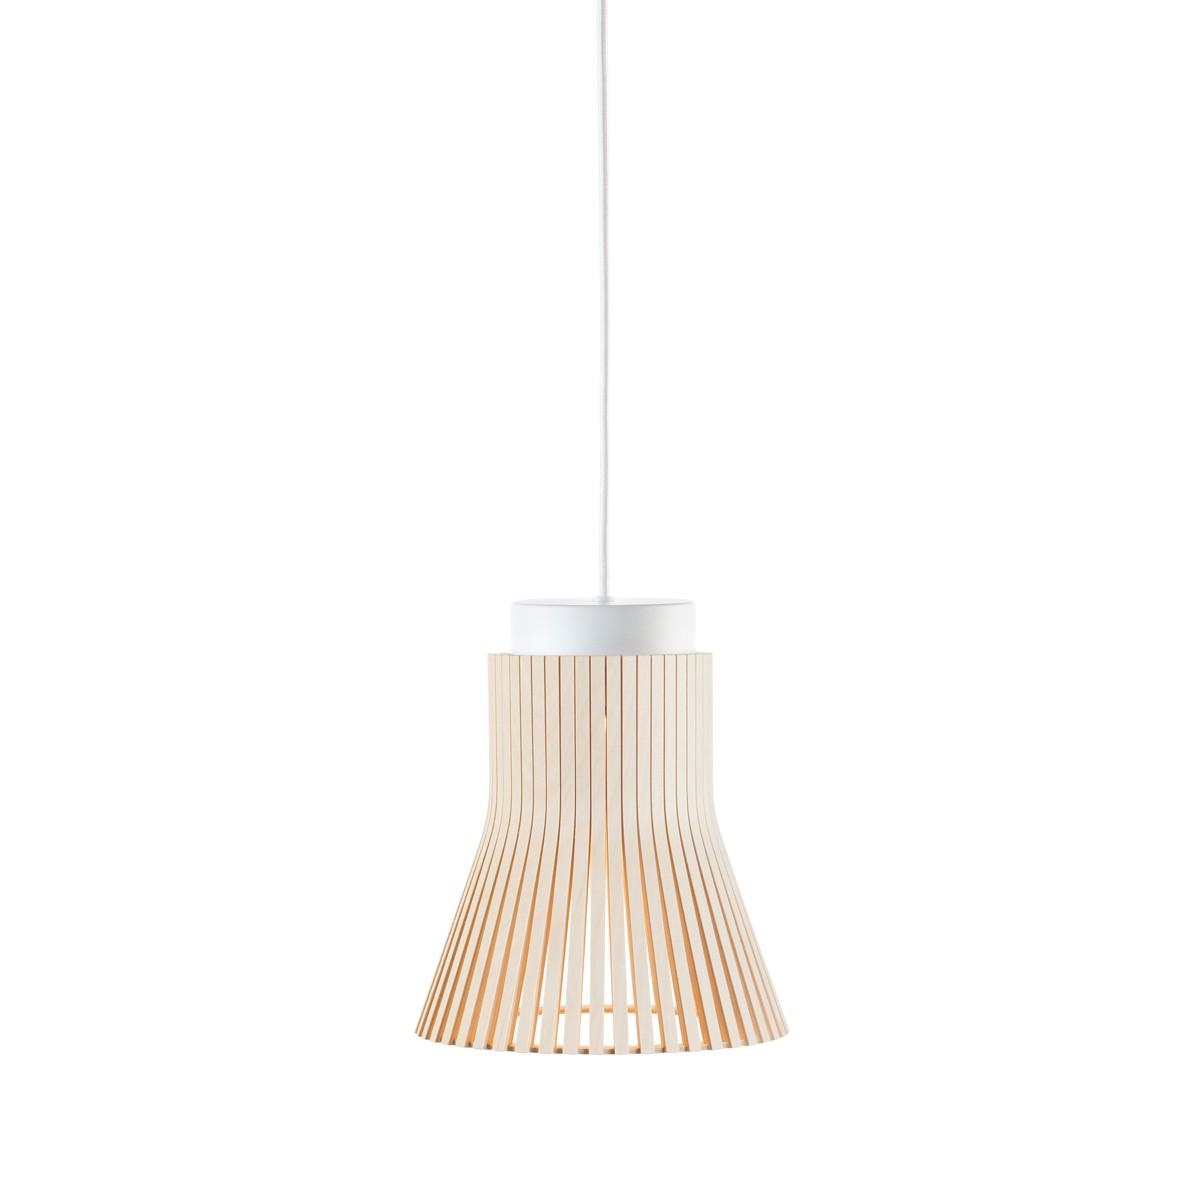 Secto Design Petite 4600 Pendelleuchte, Birke natur, Kabel: weiß